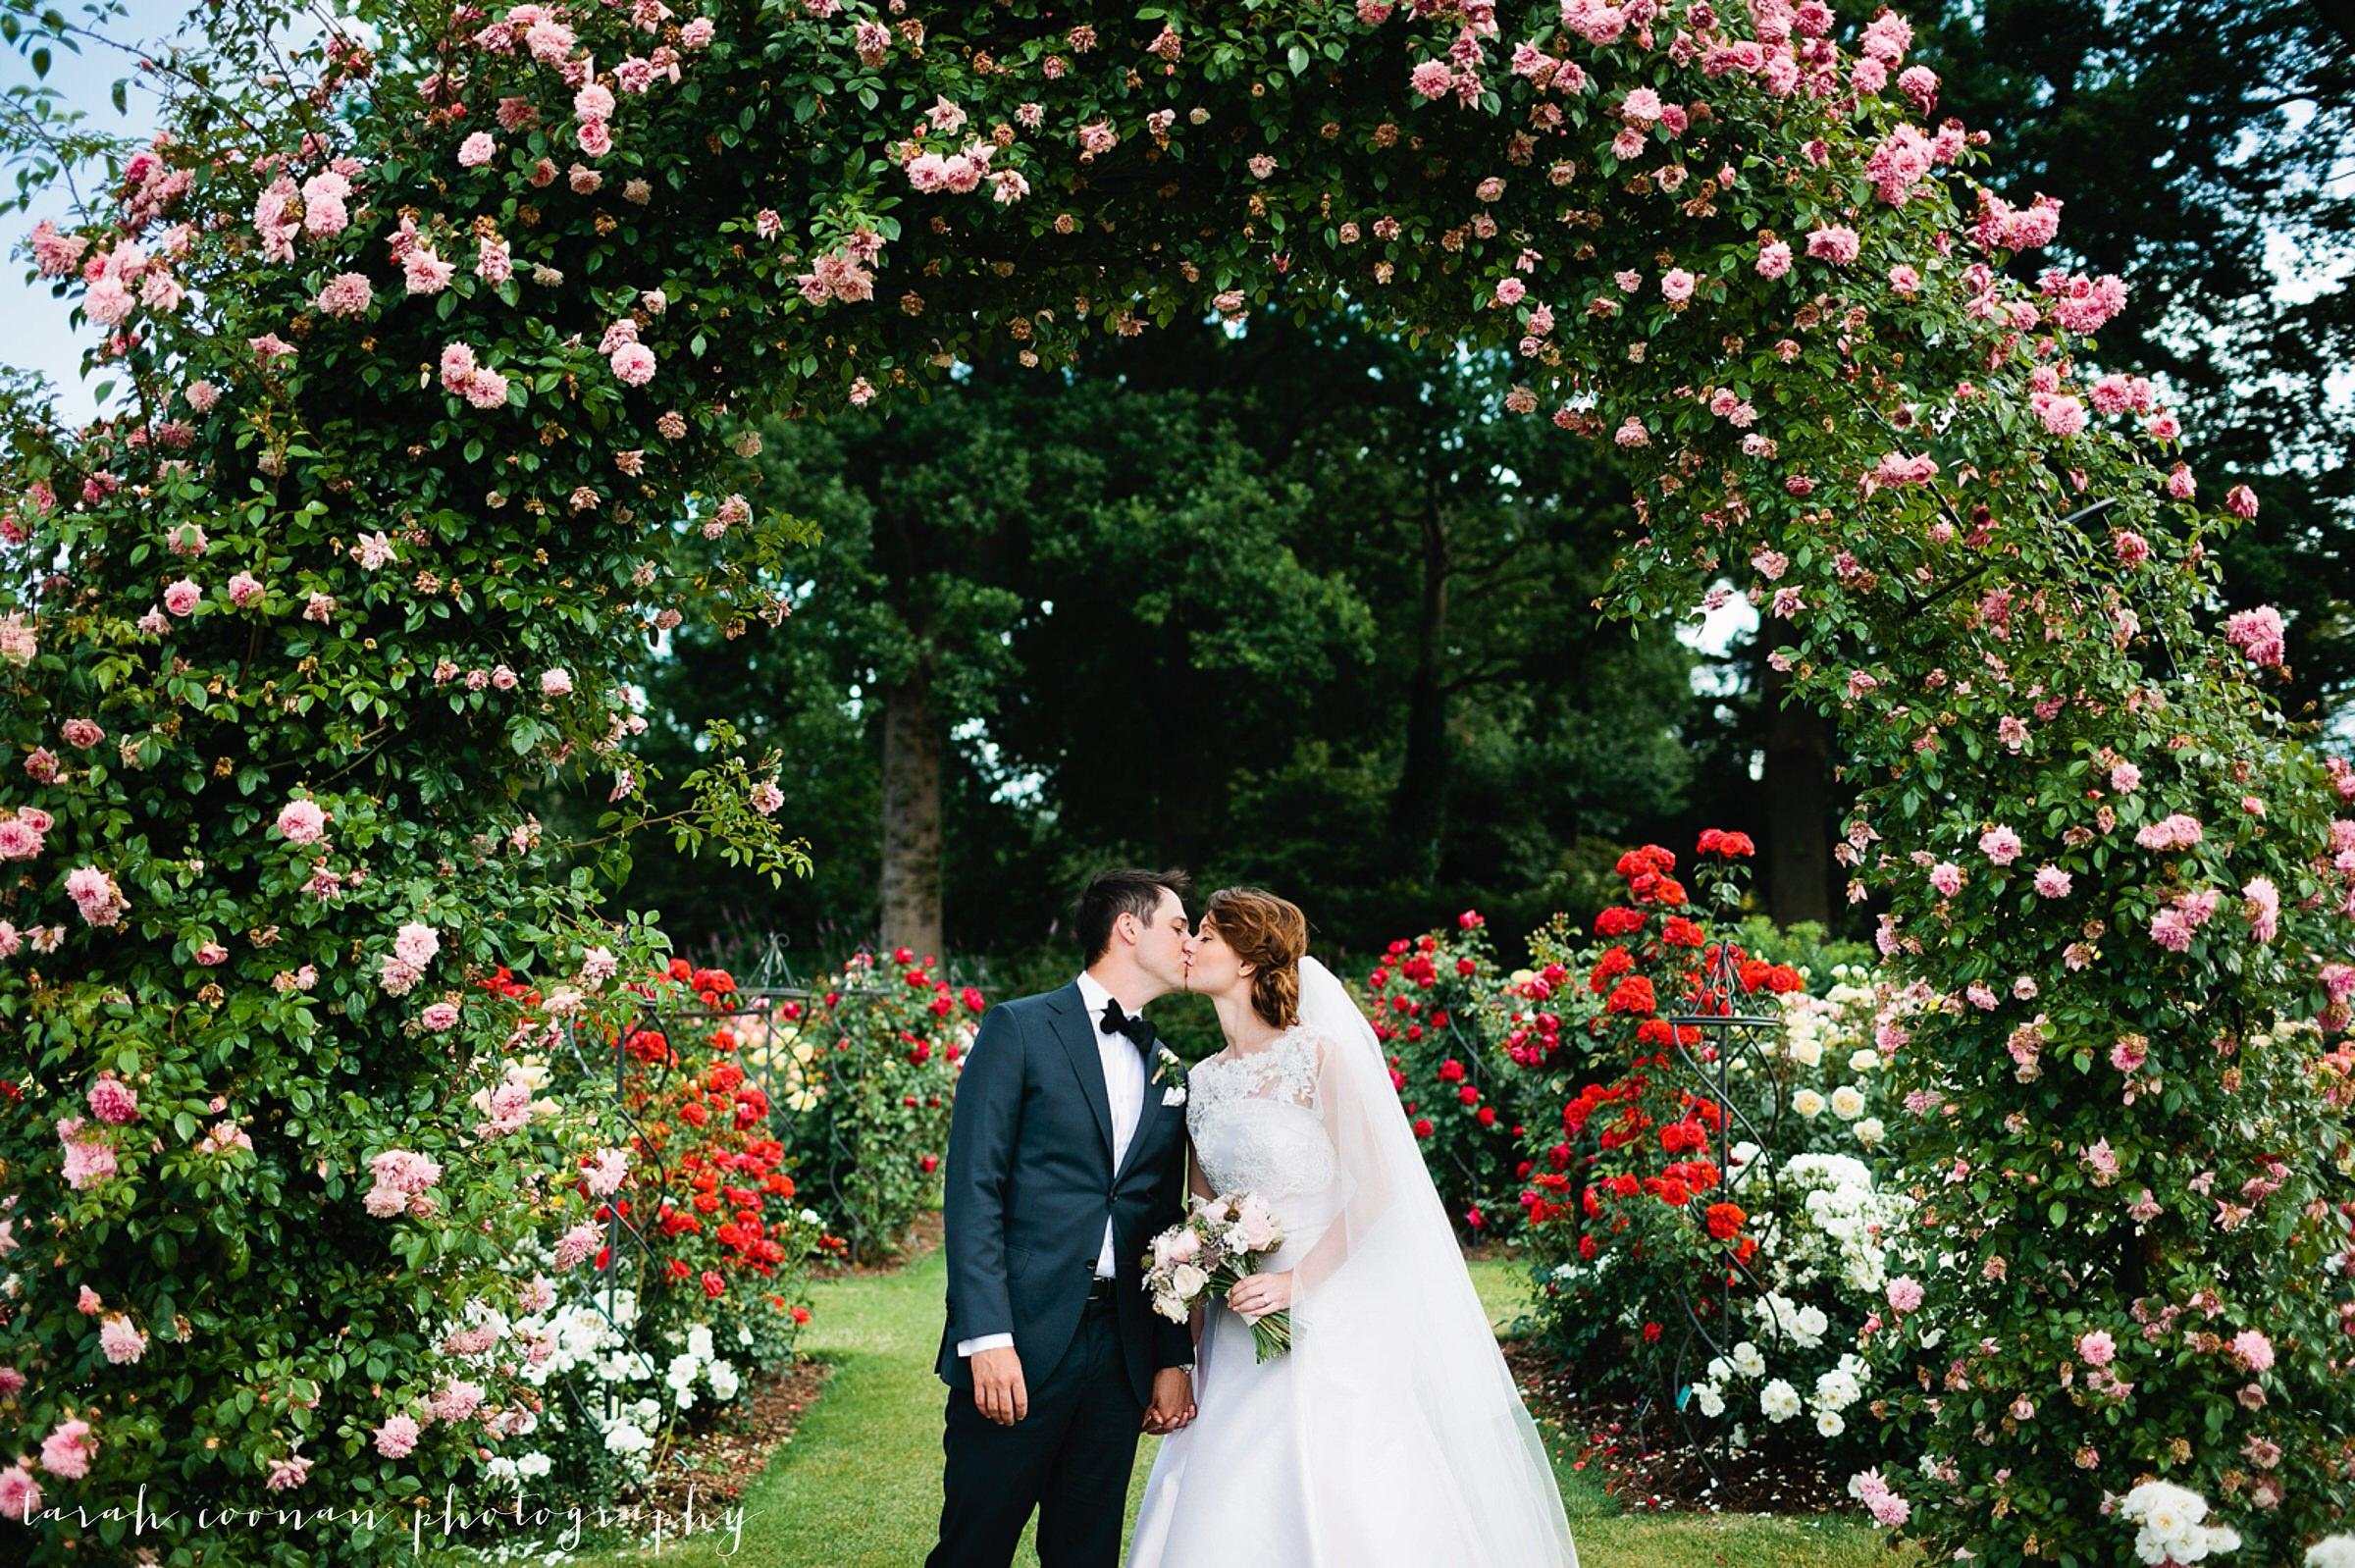 RHS Wisley rose garden June